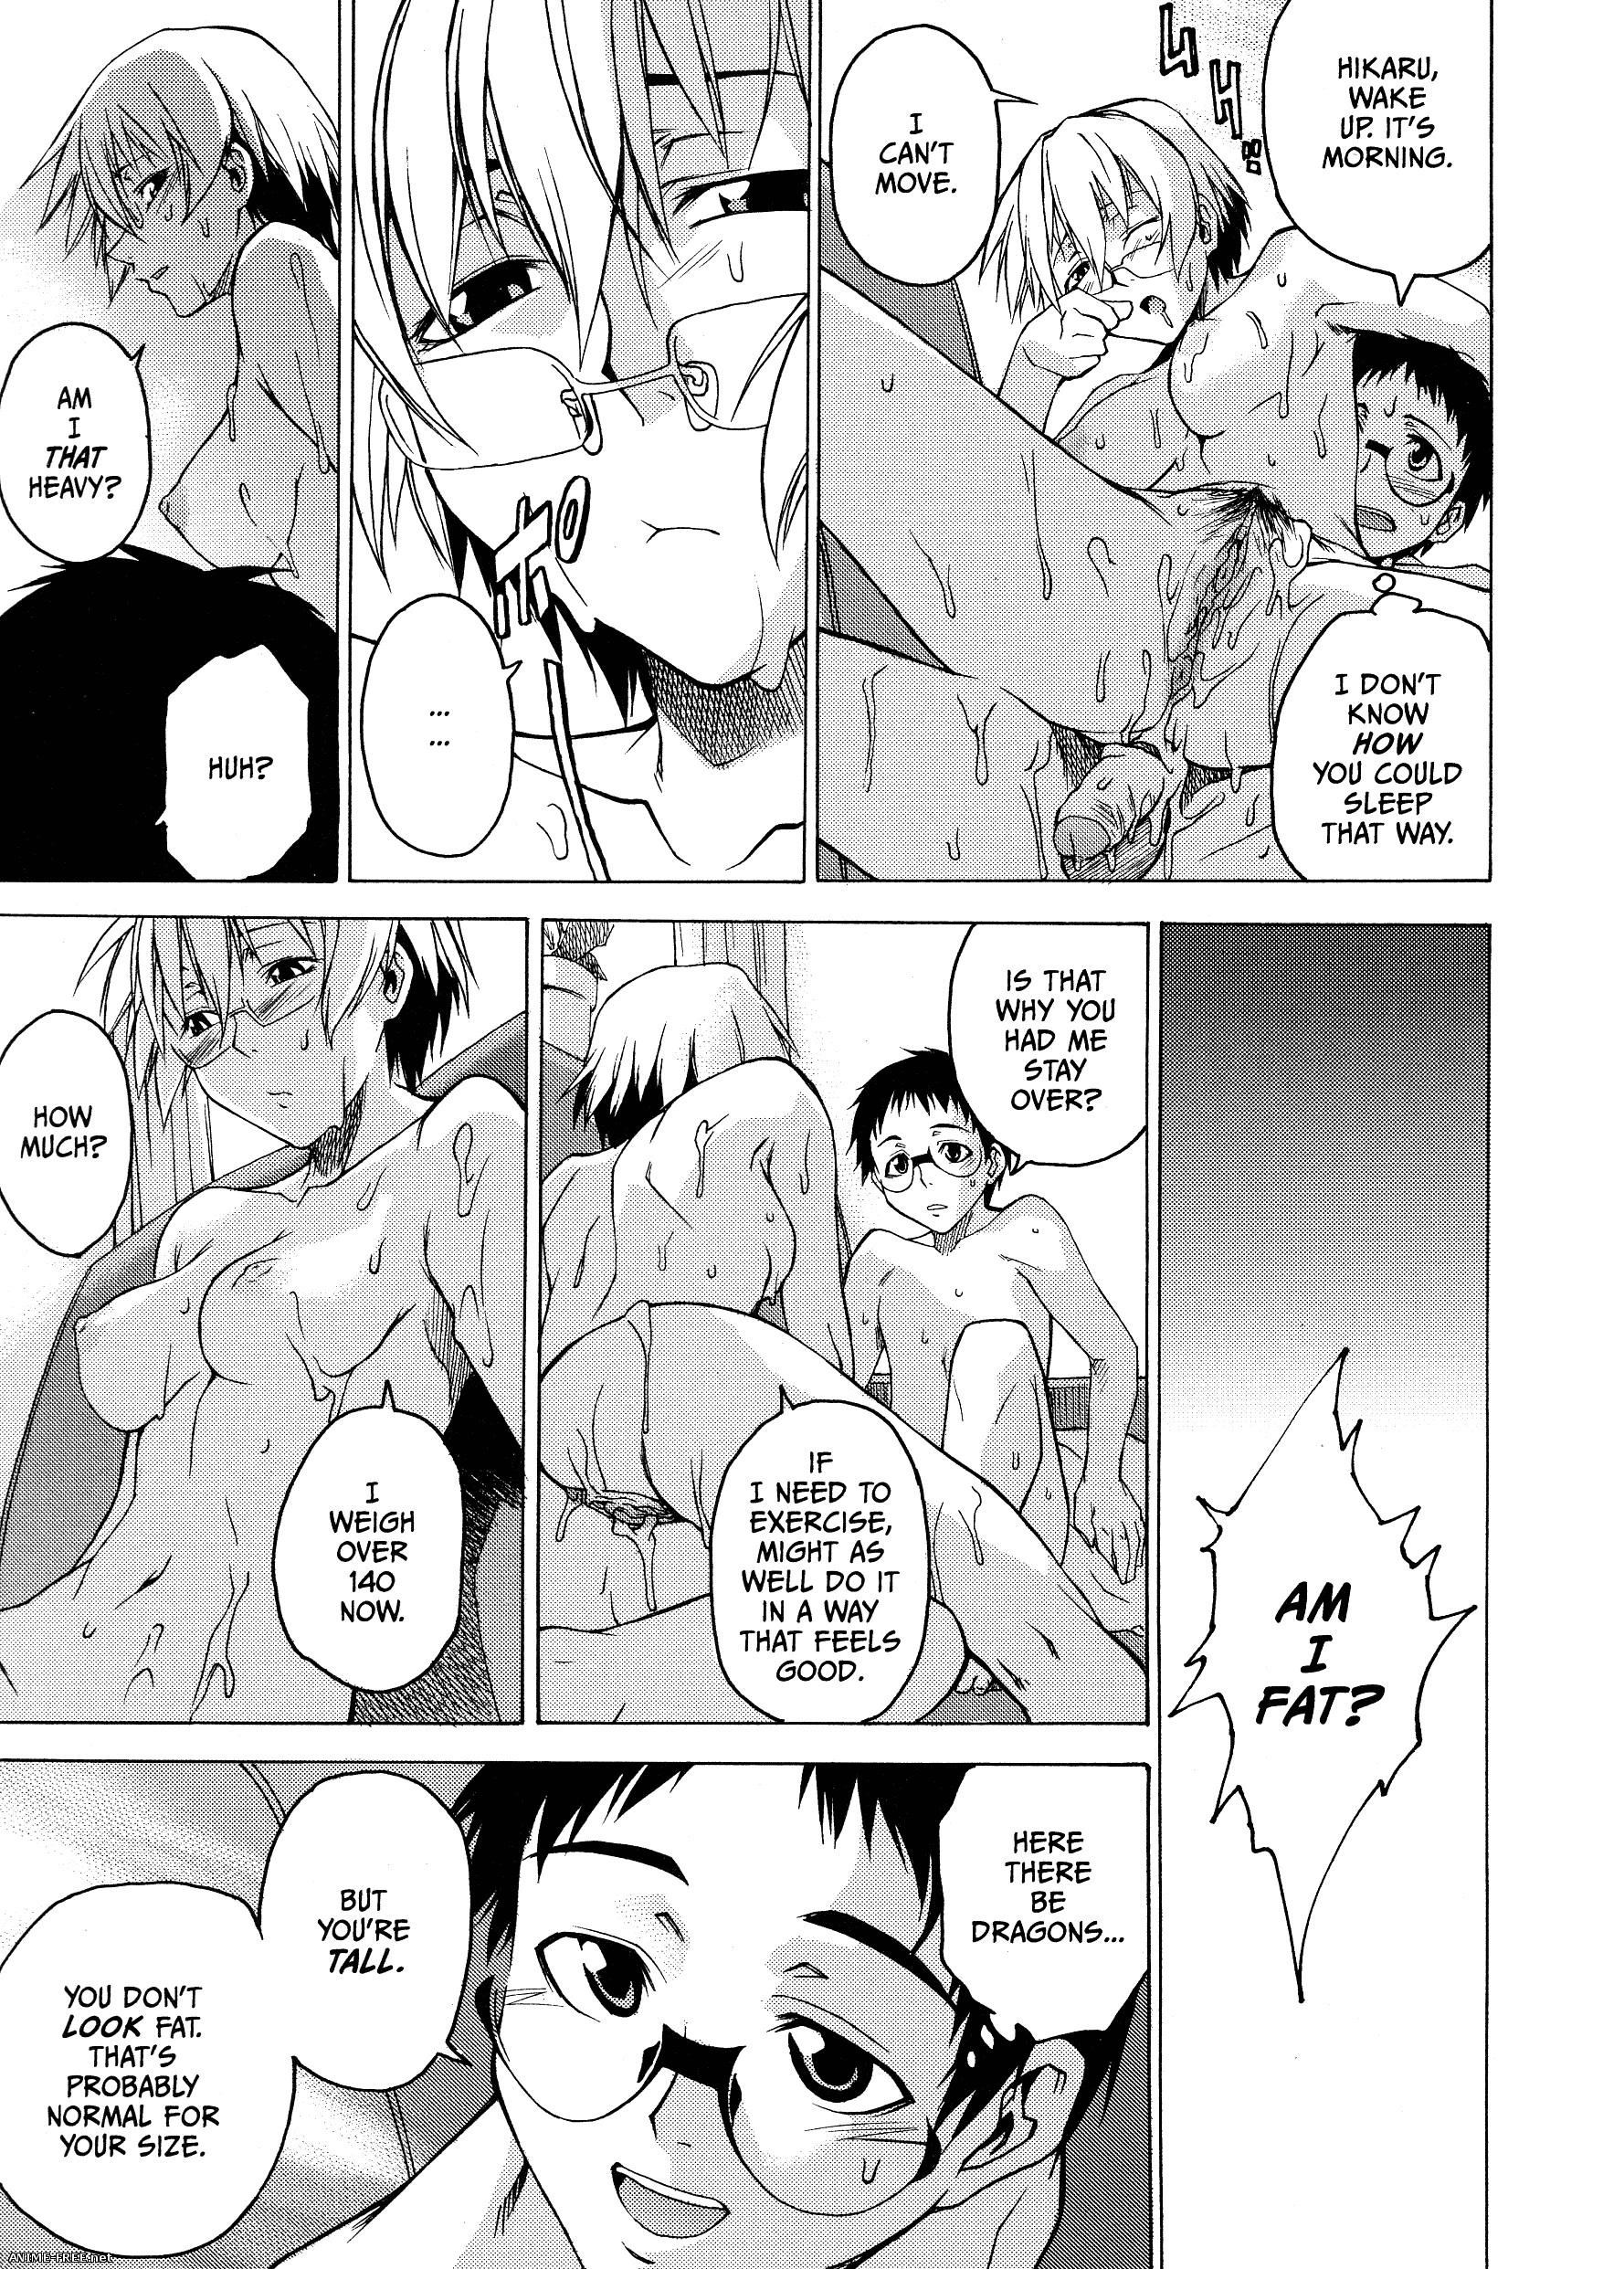 [Takemura Sessyu | Такэмура Сэссю] - Сборник хентай манги и иллюстраций [Ptcen] [JAP,ENG,RUS] Manga Hentai